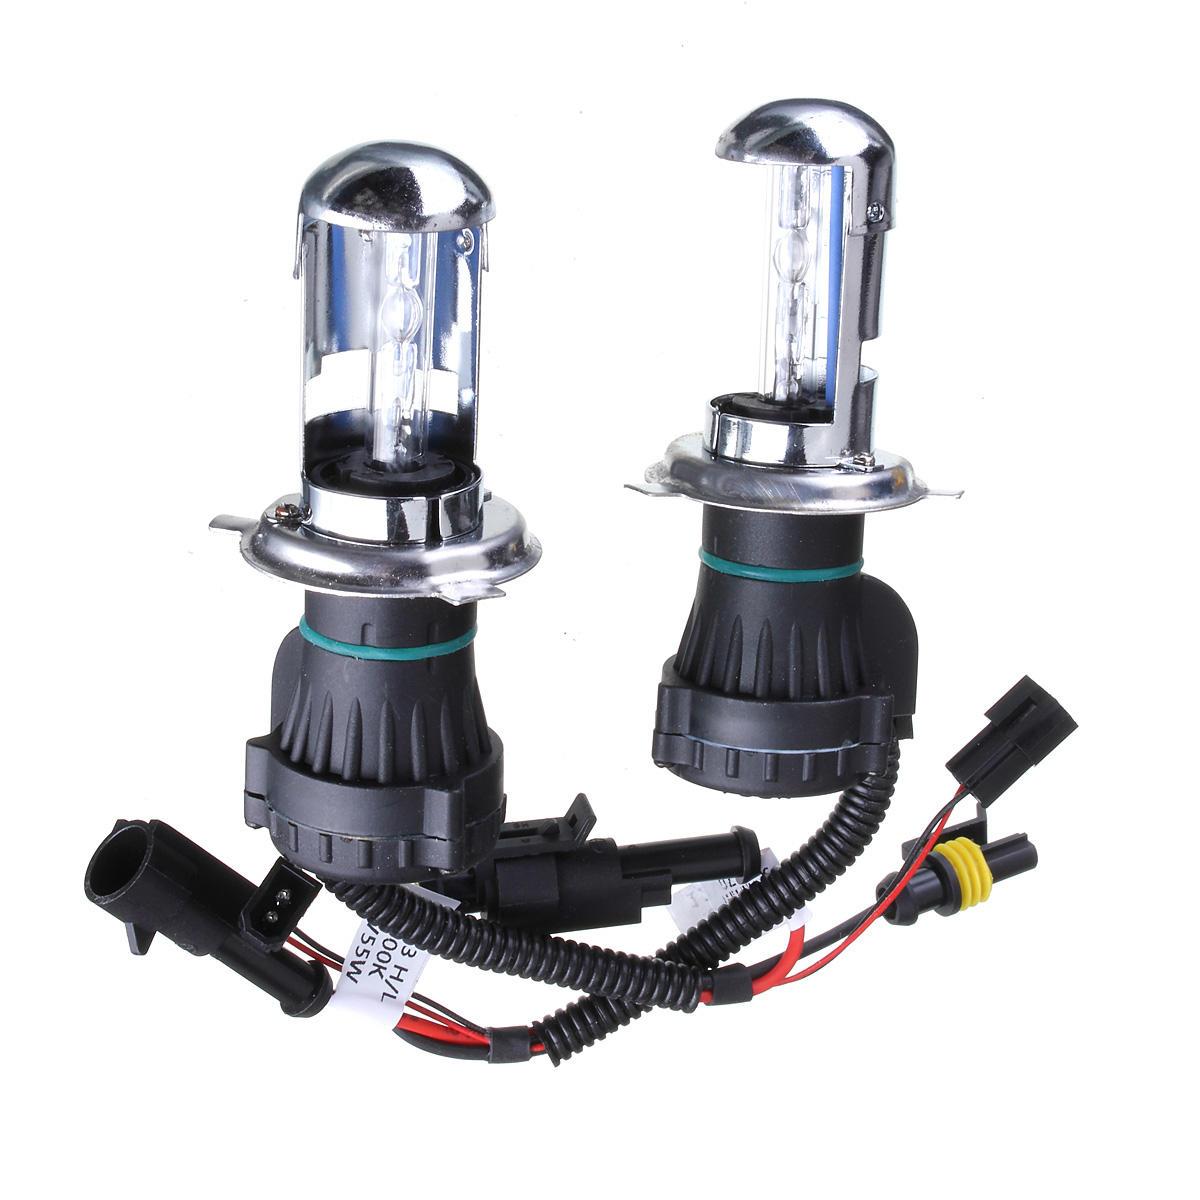 2PCS H4 55W Car HID Xenon Headlights Hi/Lo Bi Beam Headlamp Bulb 3000K-15000K